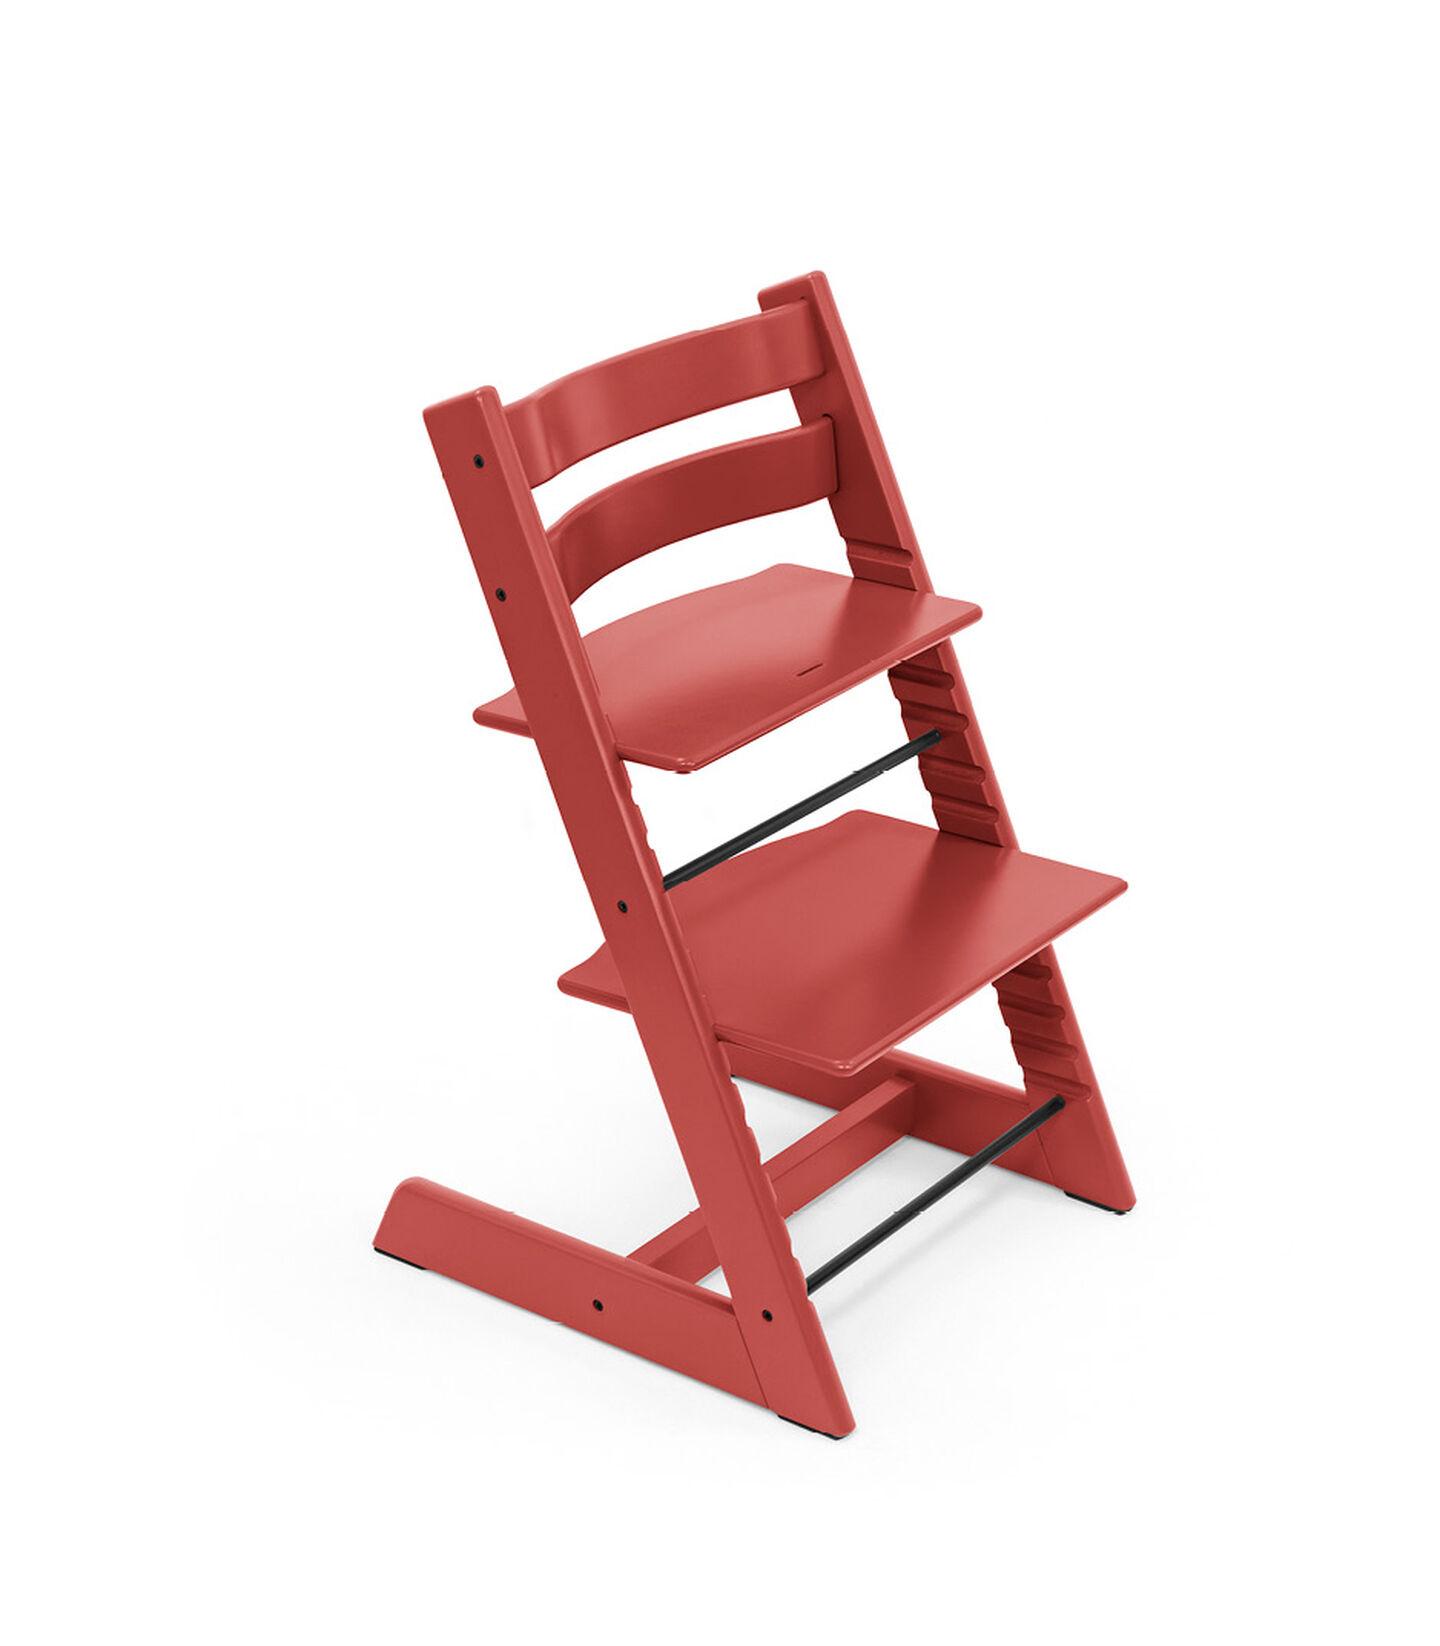 Tripp Trapp® Silla Rojo cálido, Rojo cálido, mainview view 1